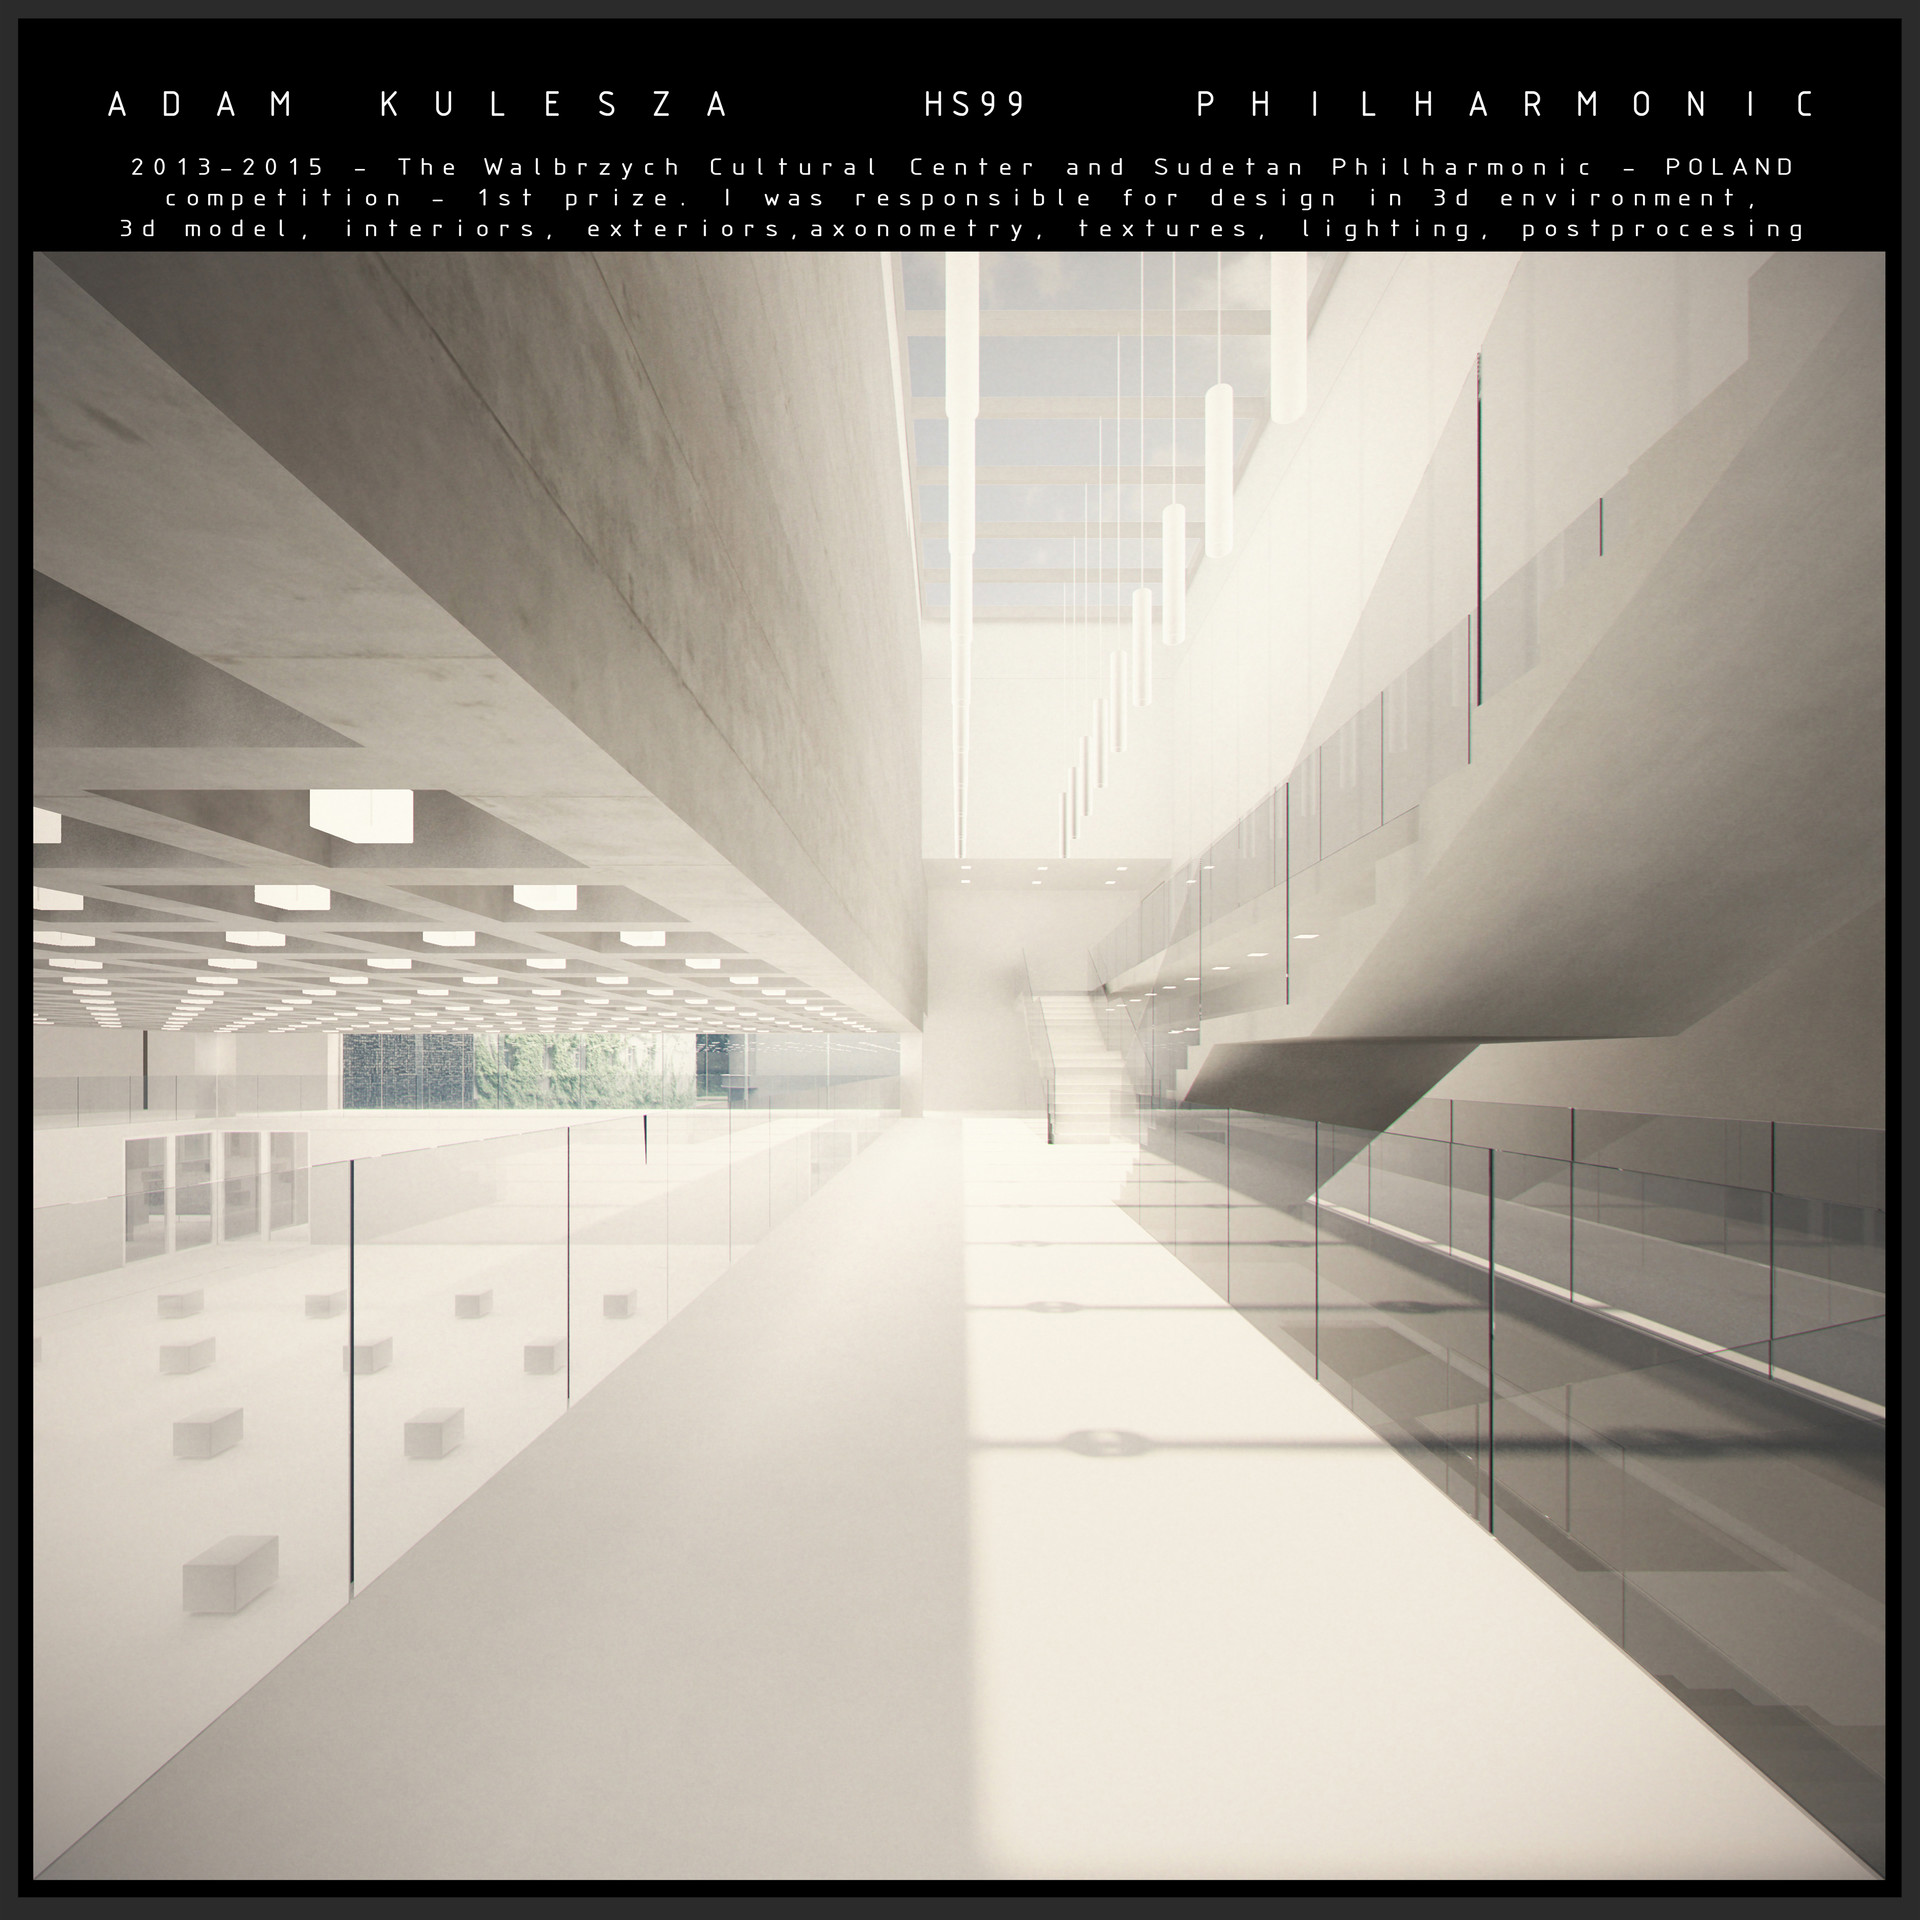 Adam bernard kulesza 2013 portfolio hs99 ckiwg 002 s